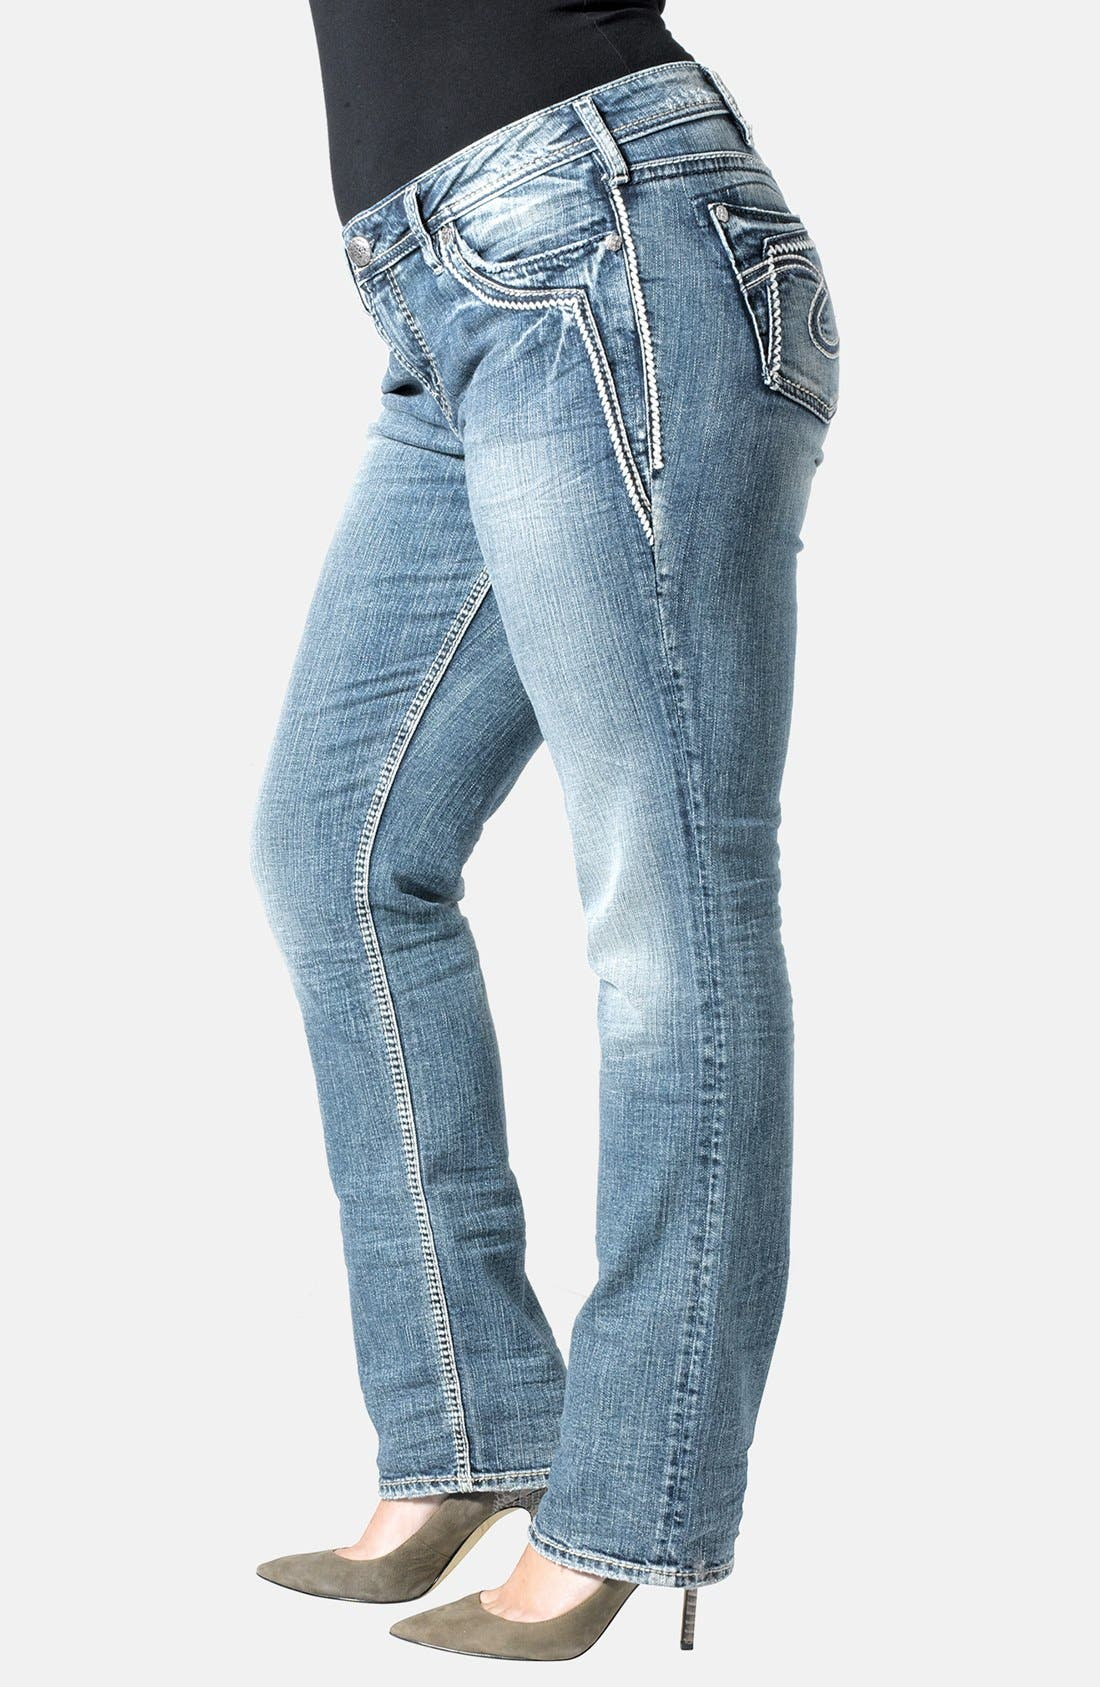 Alternate Image 3  - Silver Jeans Co. 'Aiko' Straight Leg Jeans (Indigo) (Plus Size)